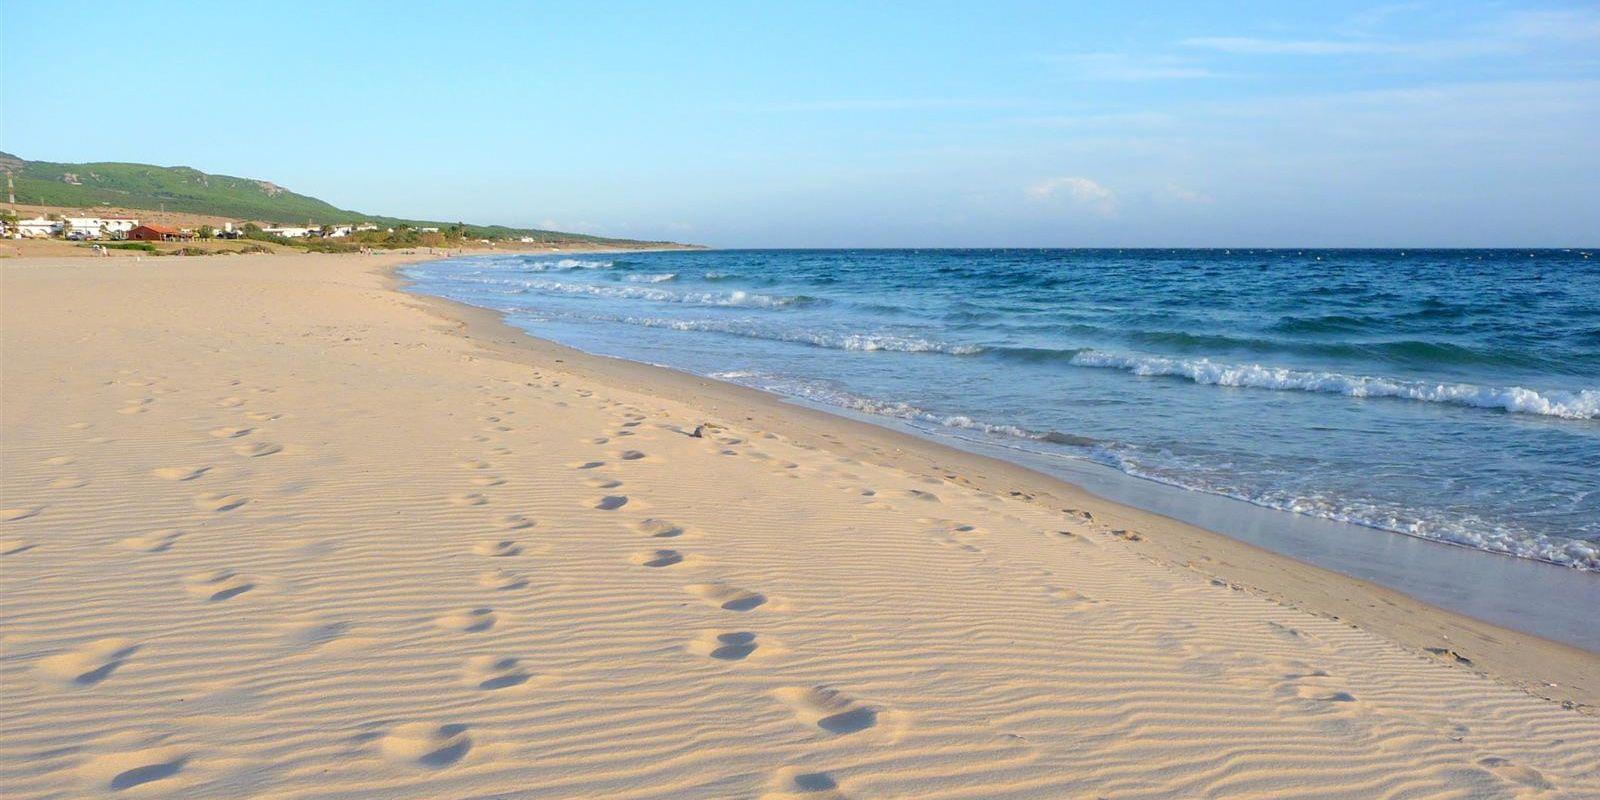 Playa de Bolonia Encanto Natural